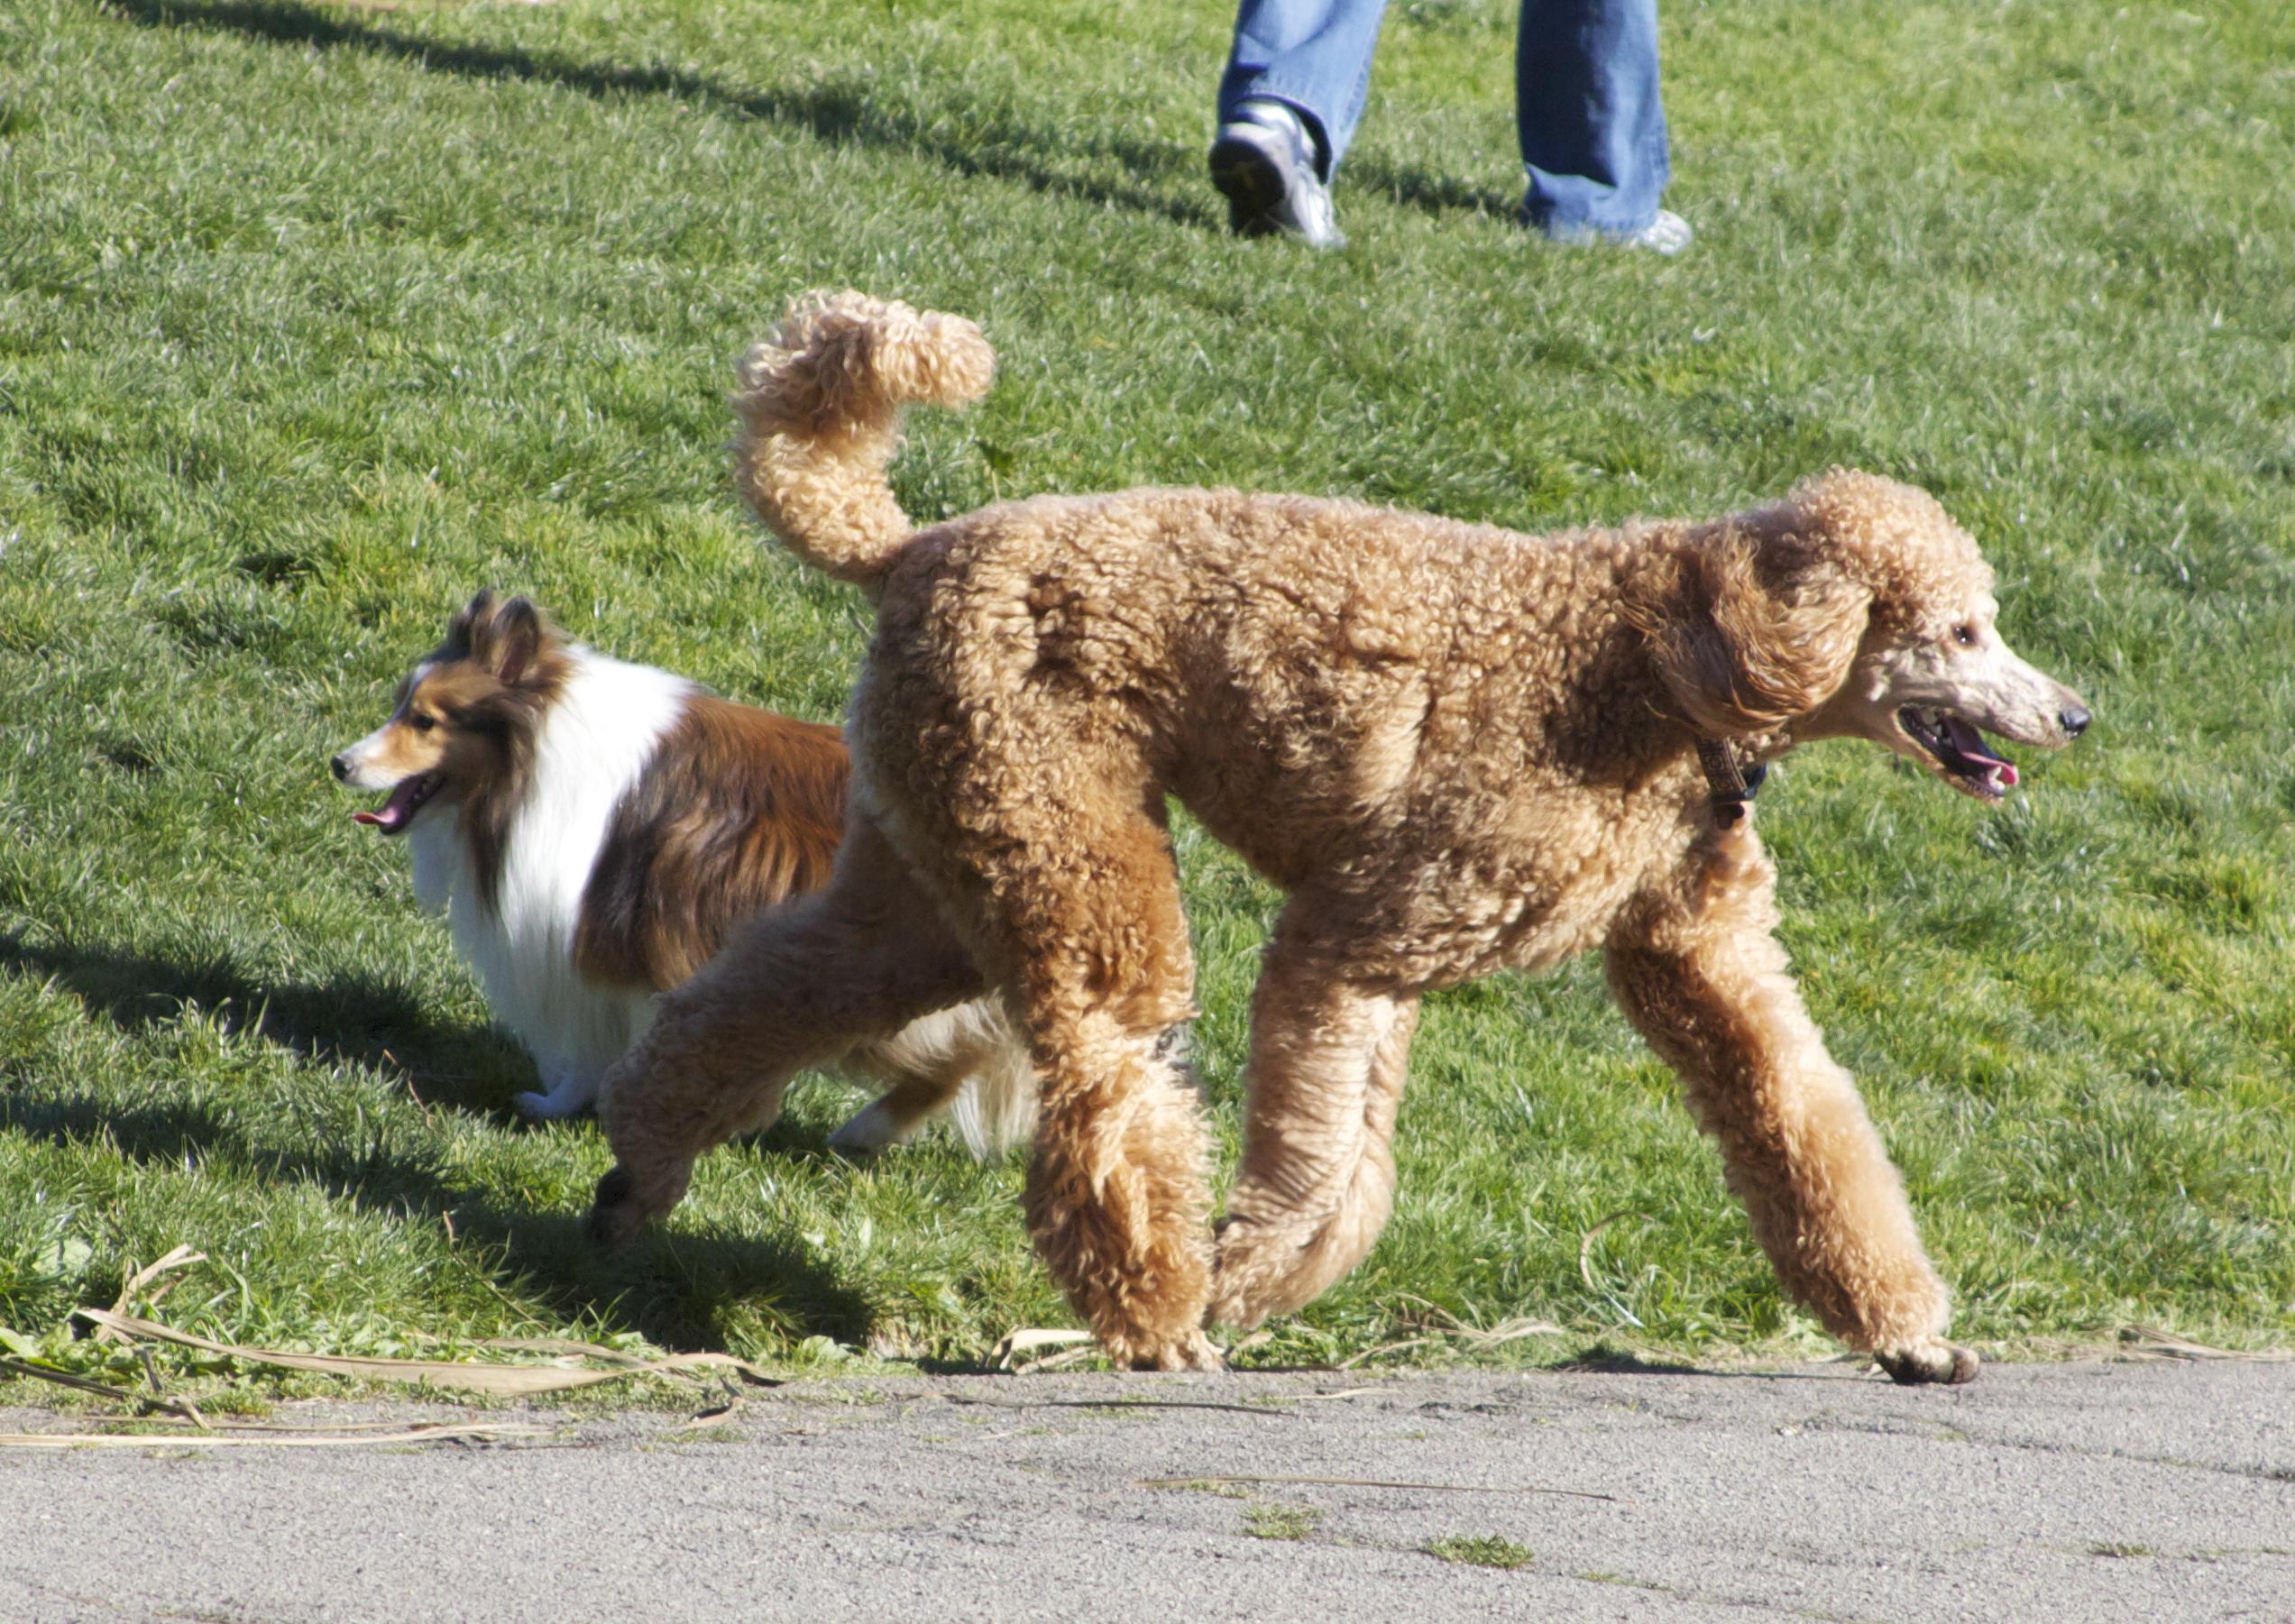 Apricot Standard Poodle and Tricolor Shetland Sheepdog/Sheltie